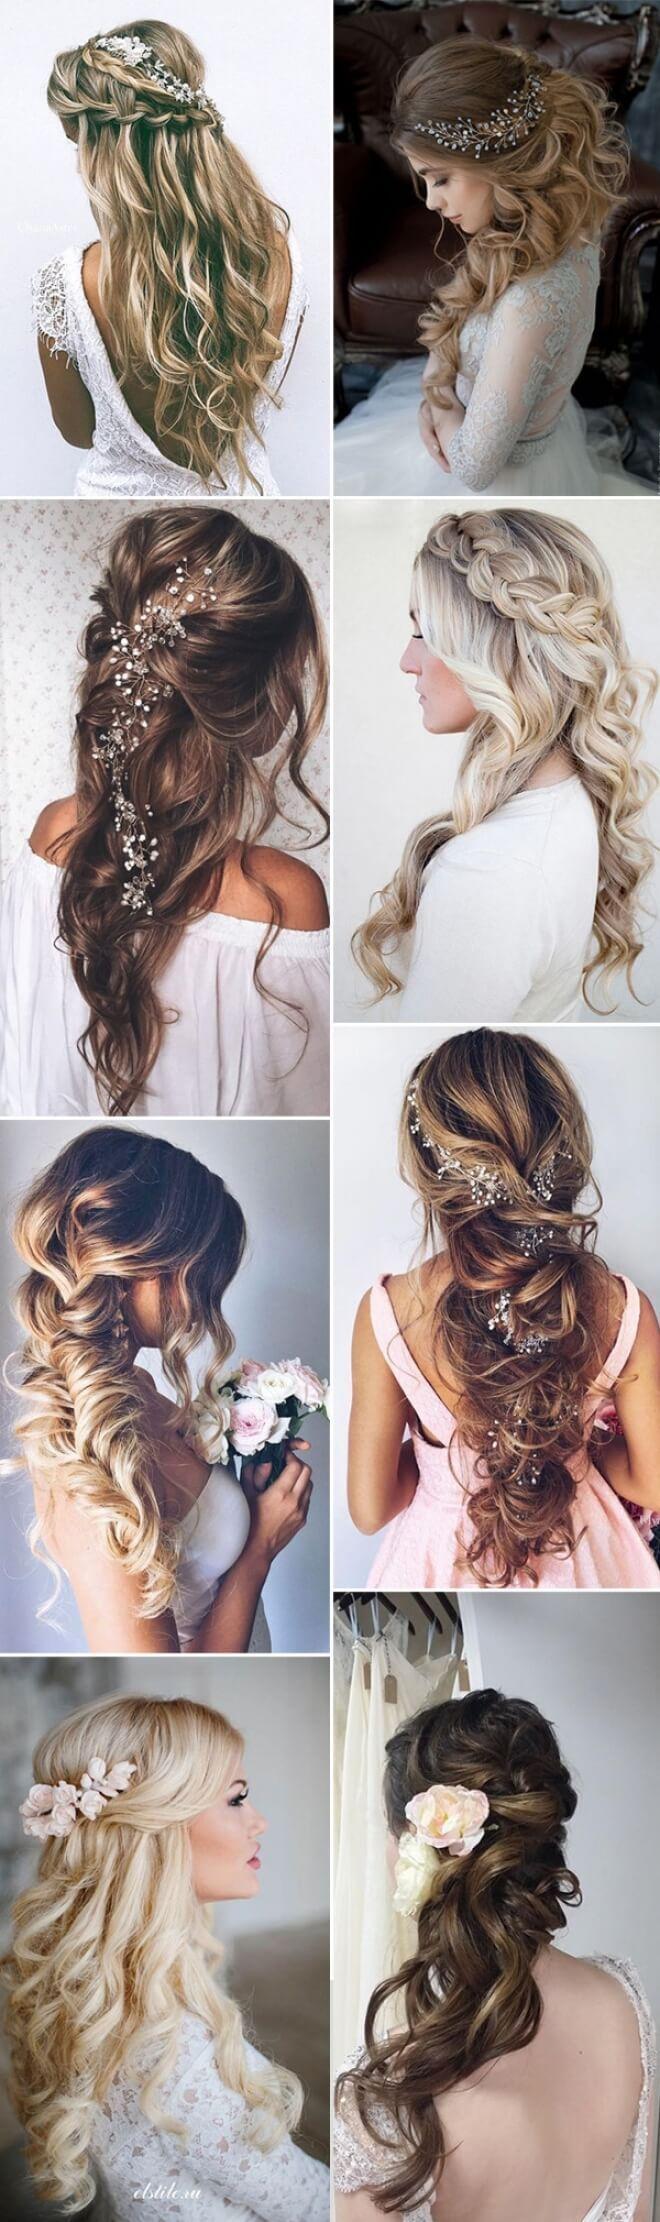 amazing half up half down wedding hairstyle ideas oh best day